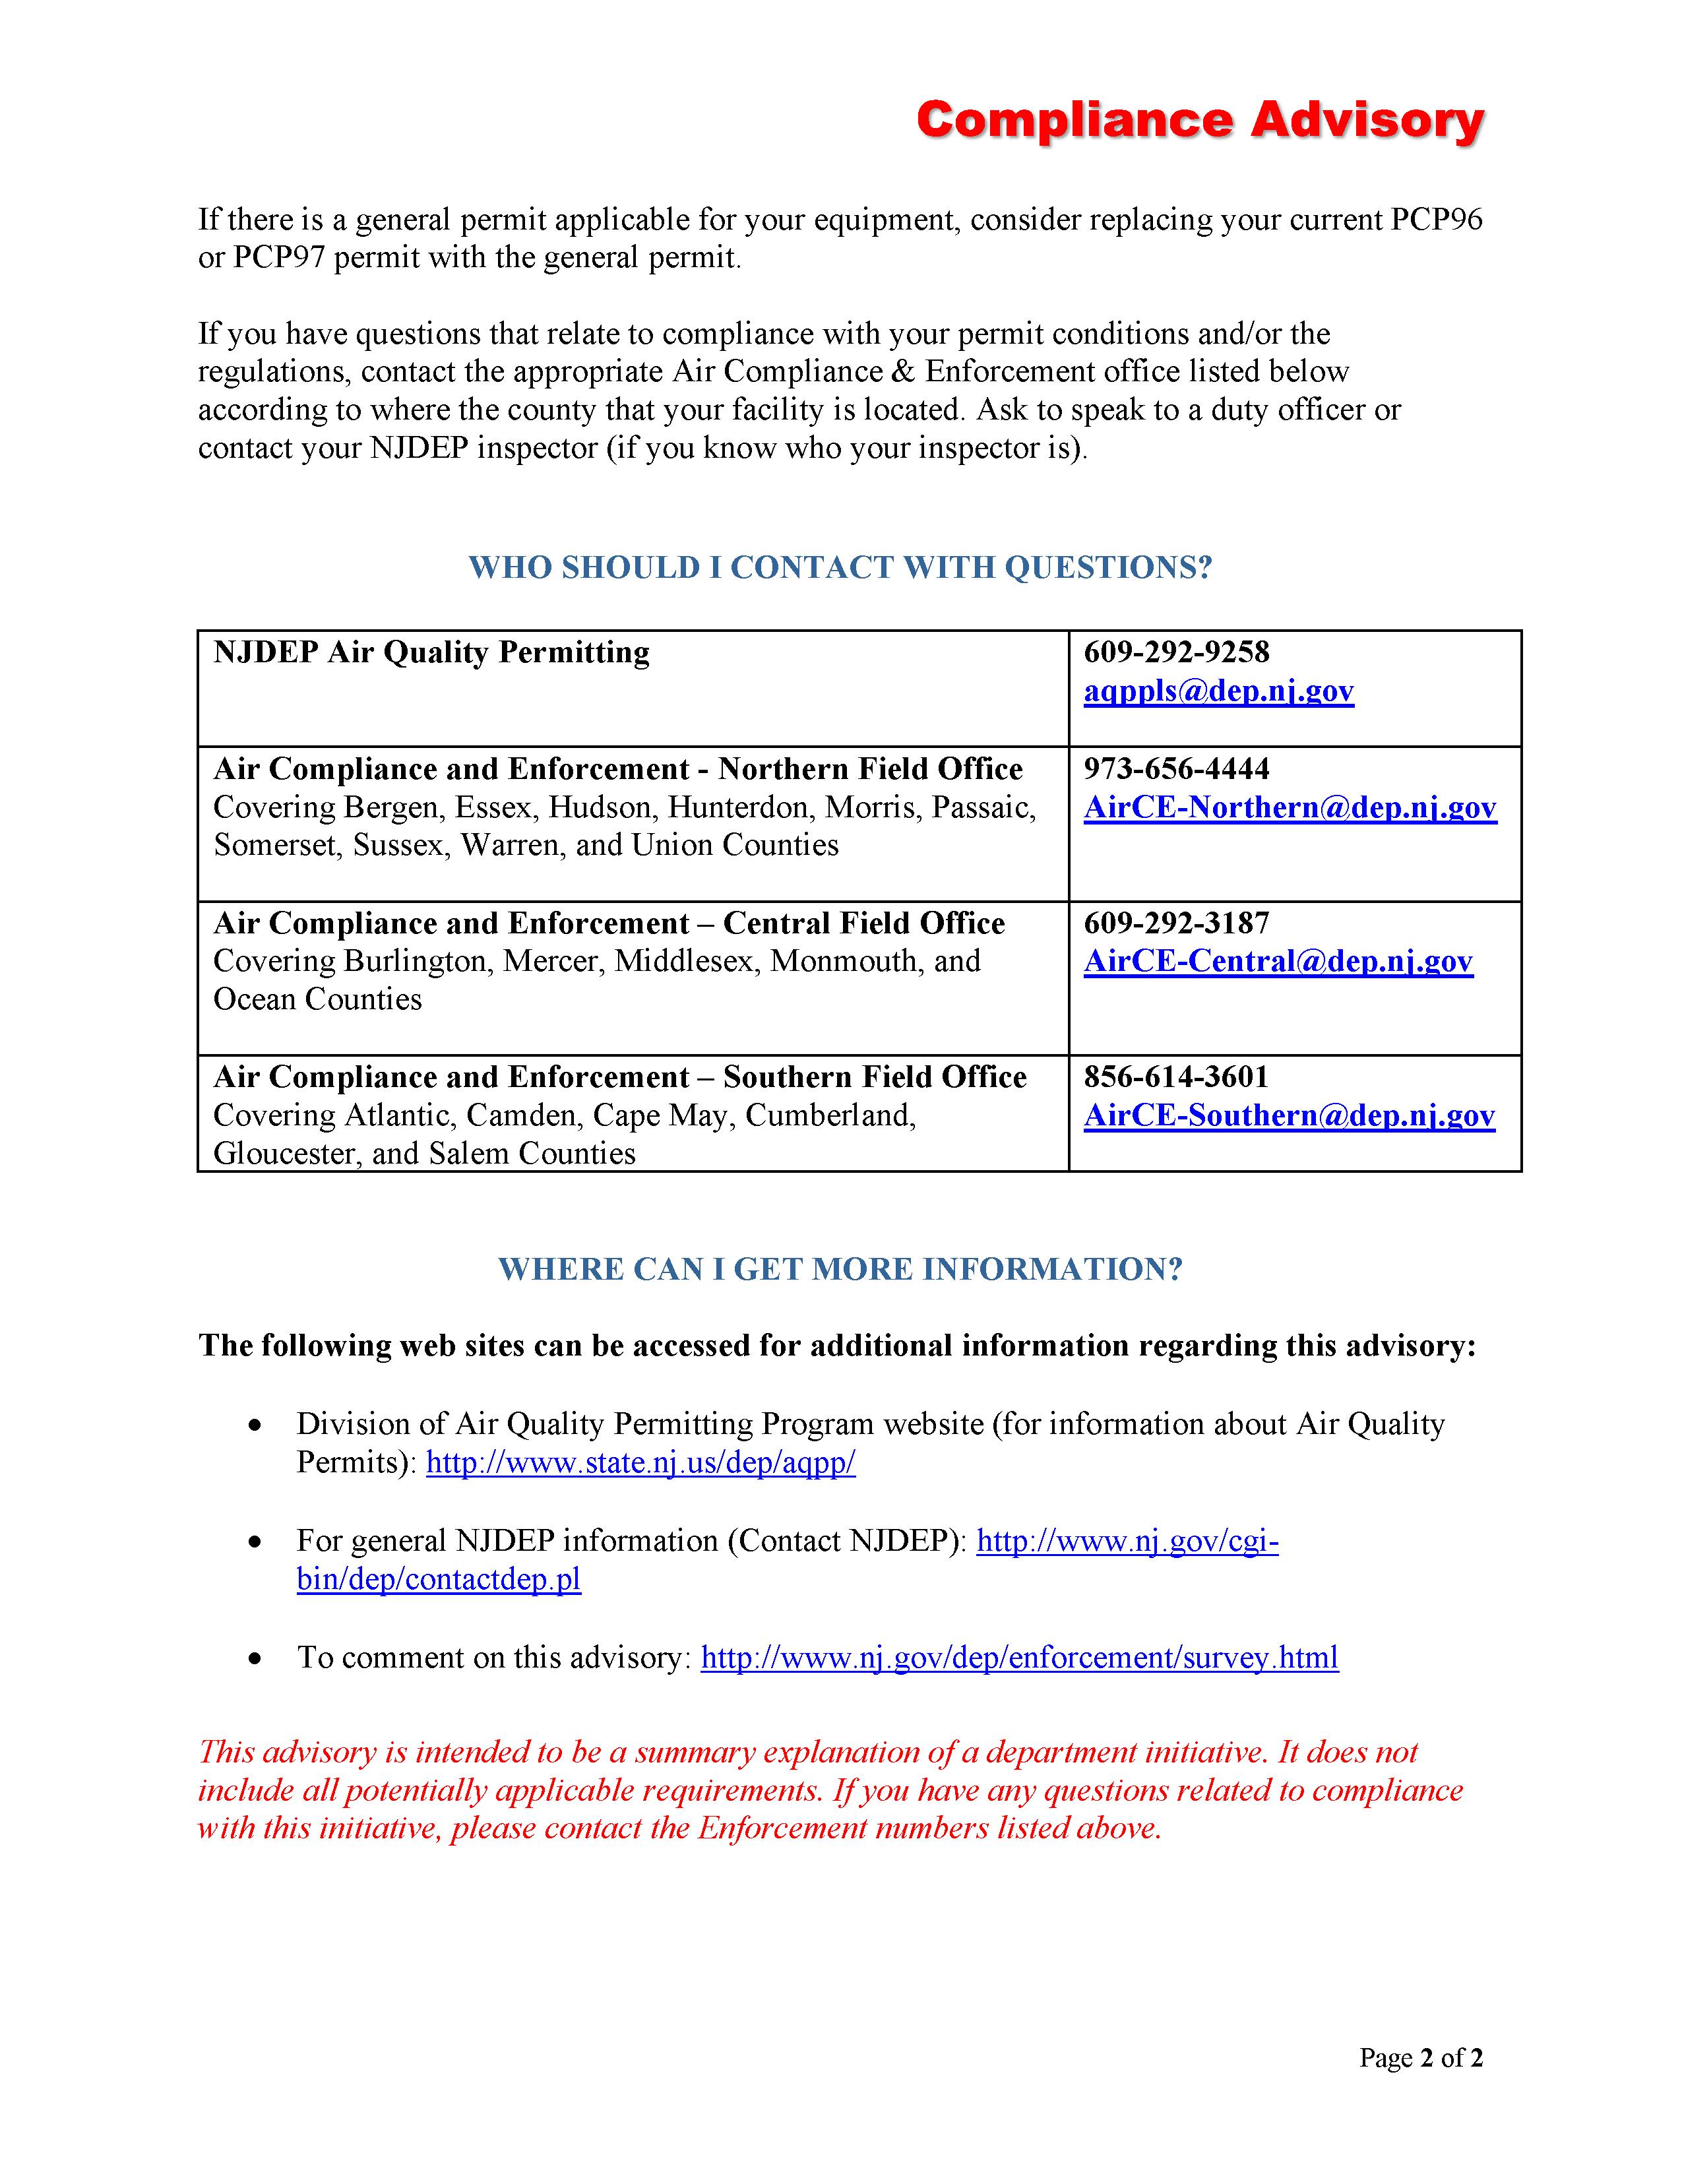 NJDEP PCP97 Air Permit Compliance Advisory